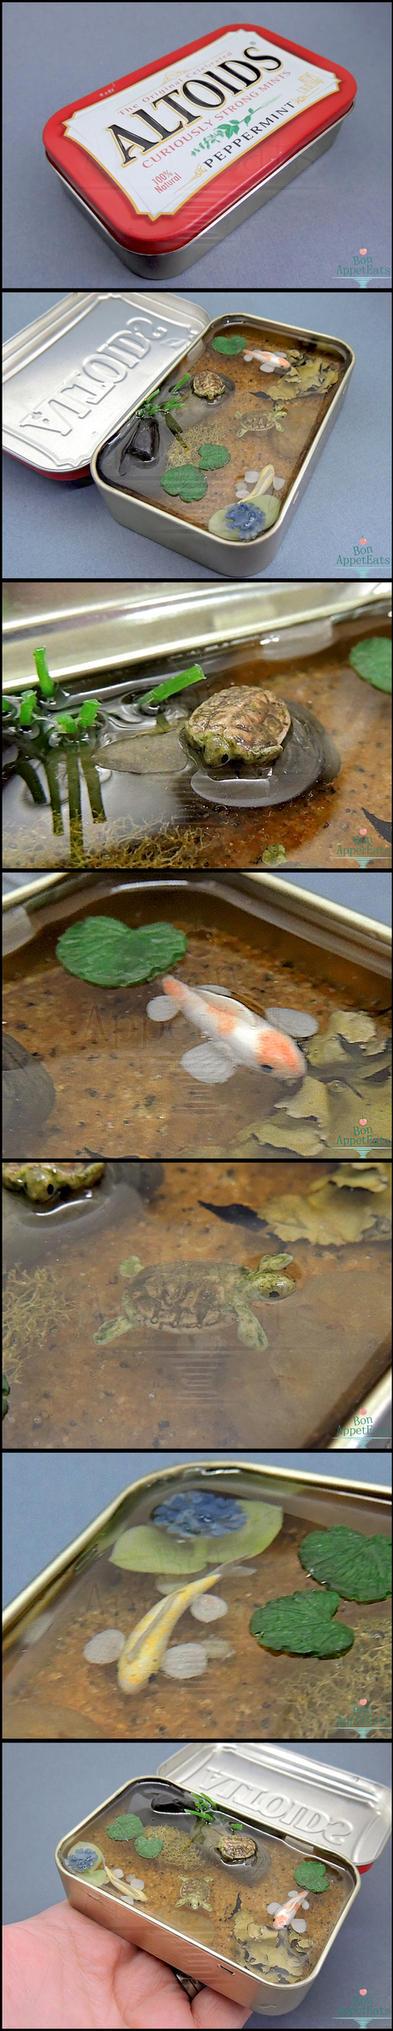 FOR SALE - Miniature Koi and Turtle Altoids Pond by Bon-AppetEats